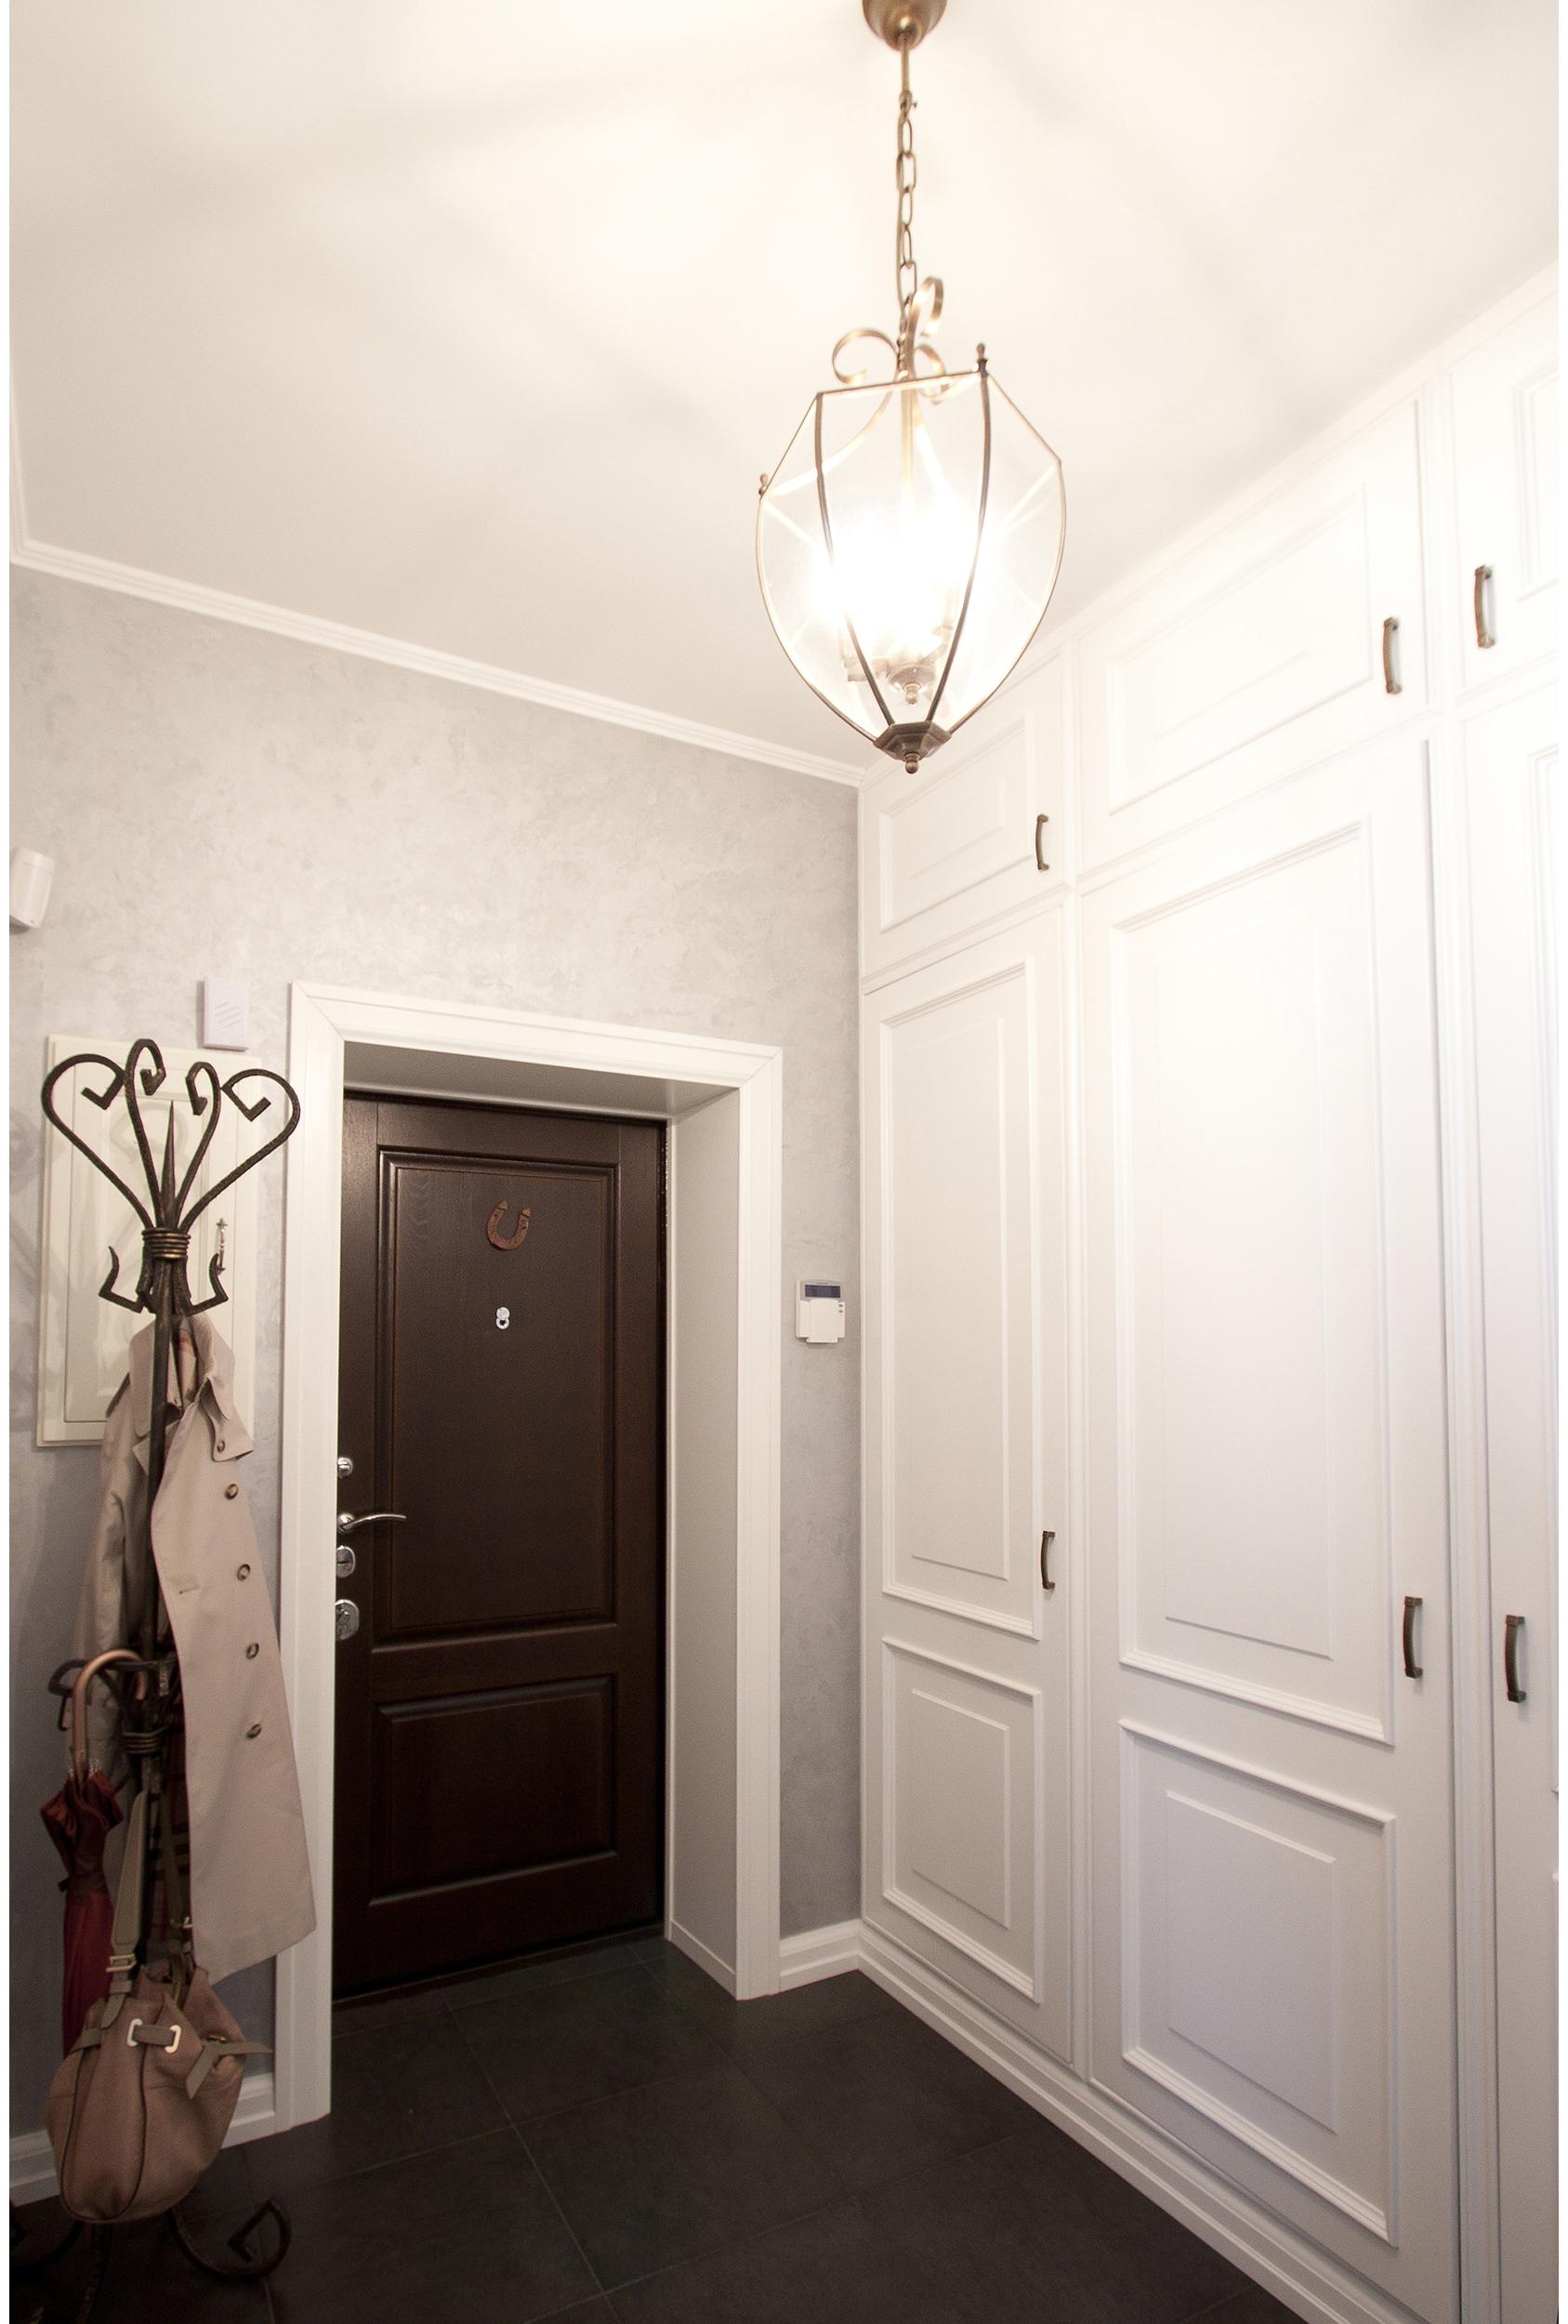 Copy of Traditional home interior